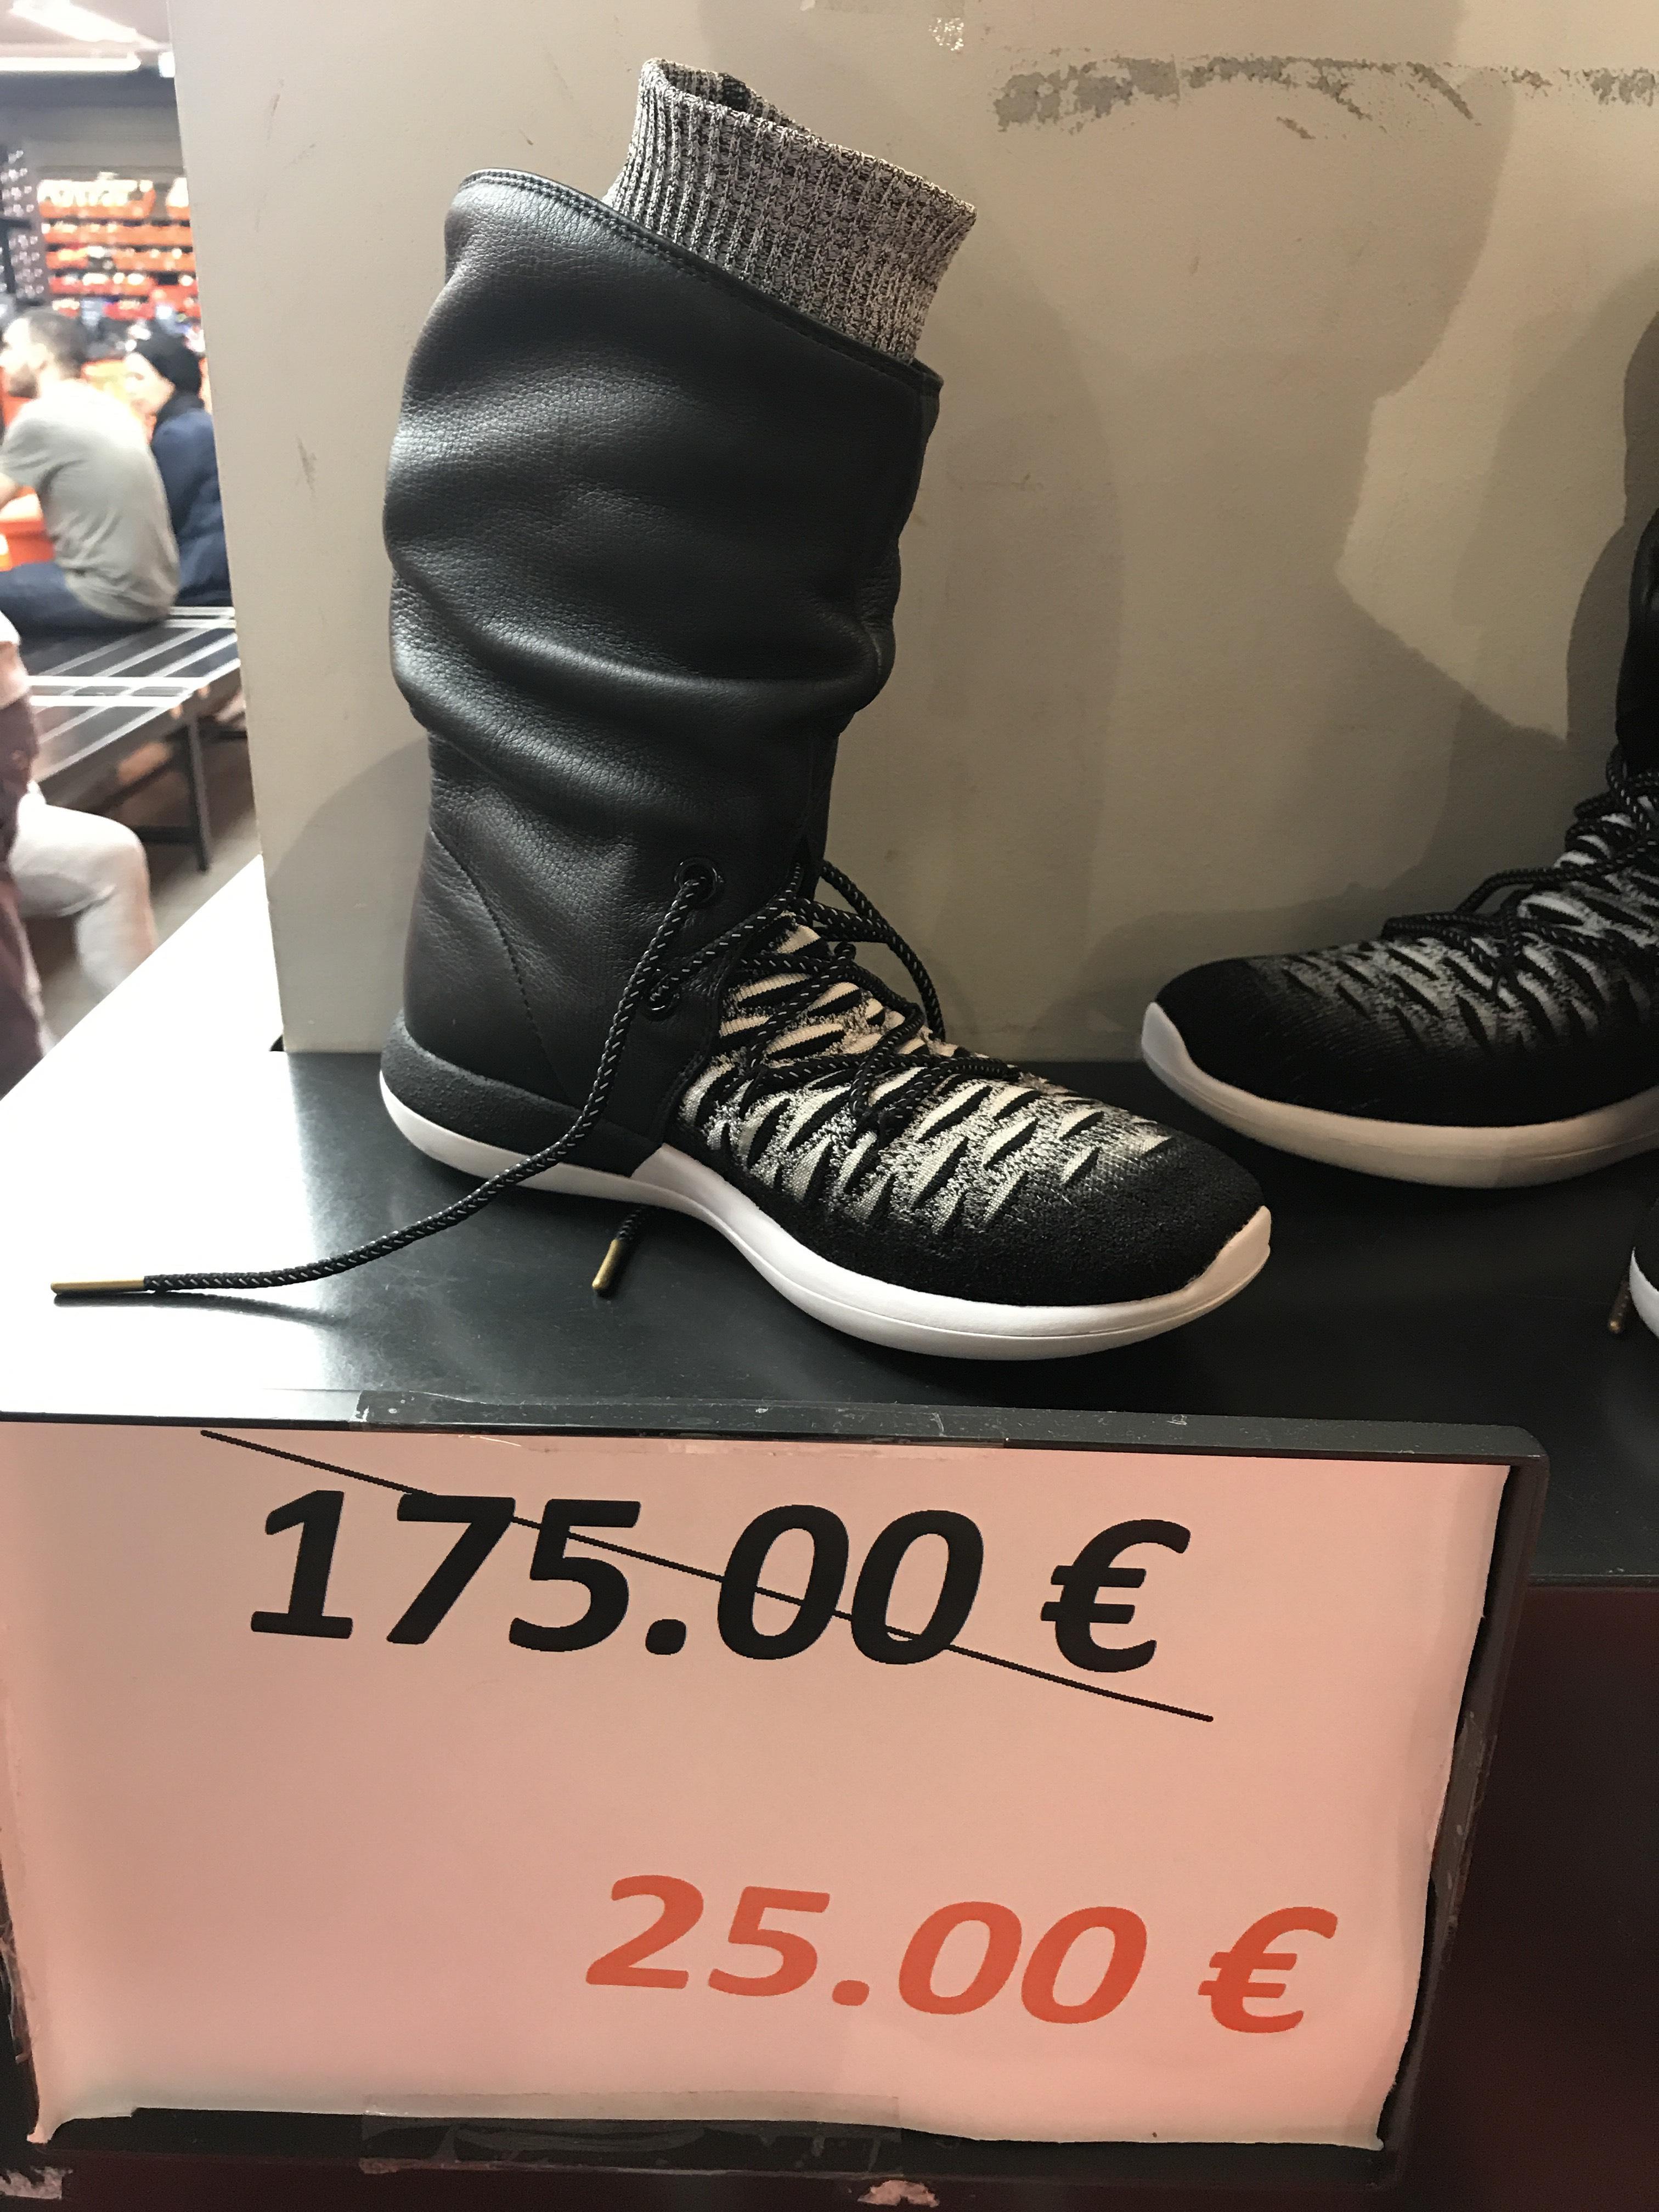 Chaussures Nike Roshe Two Hi Flyknit W pour Femmes - Nike Store Villeurbanne (69)